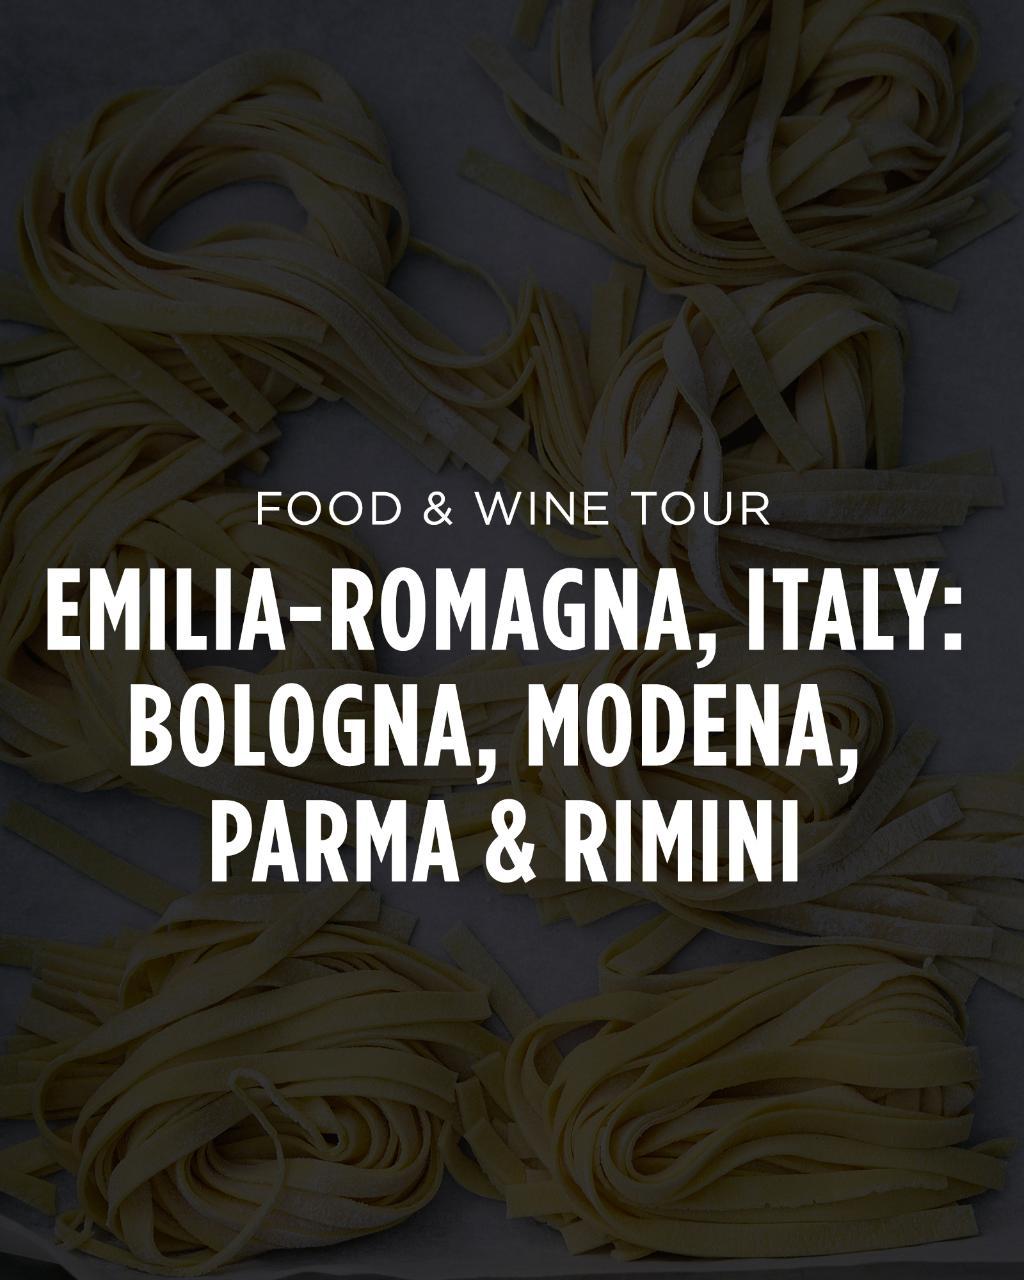 Italy Food & Wine Tour || Emilia-Romagna: Bologna, Modena & Parma